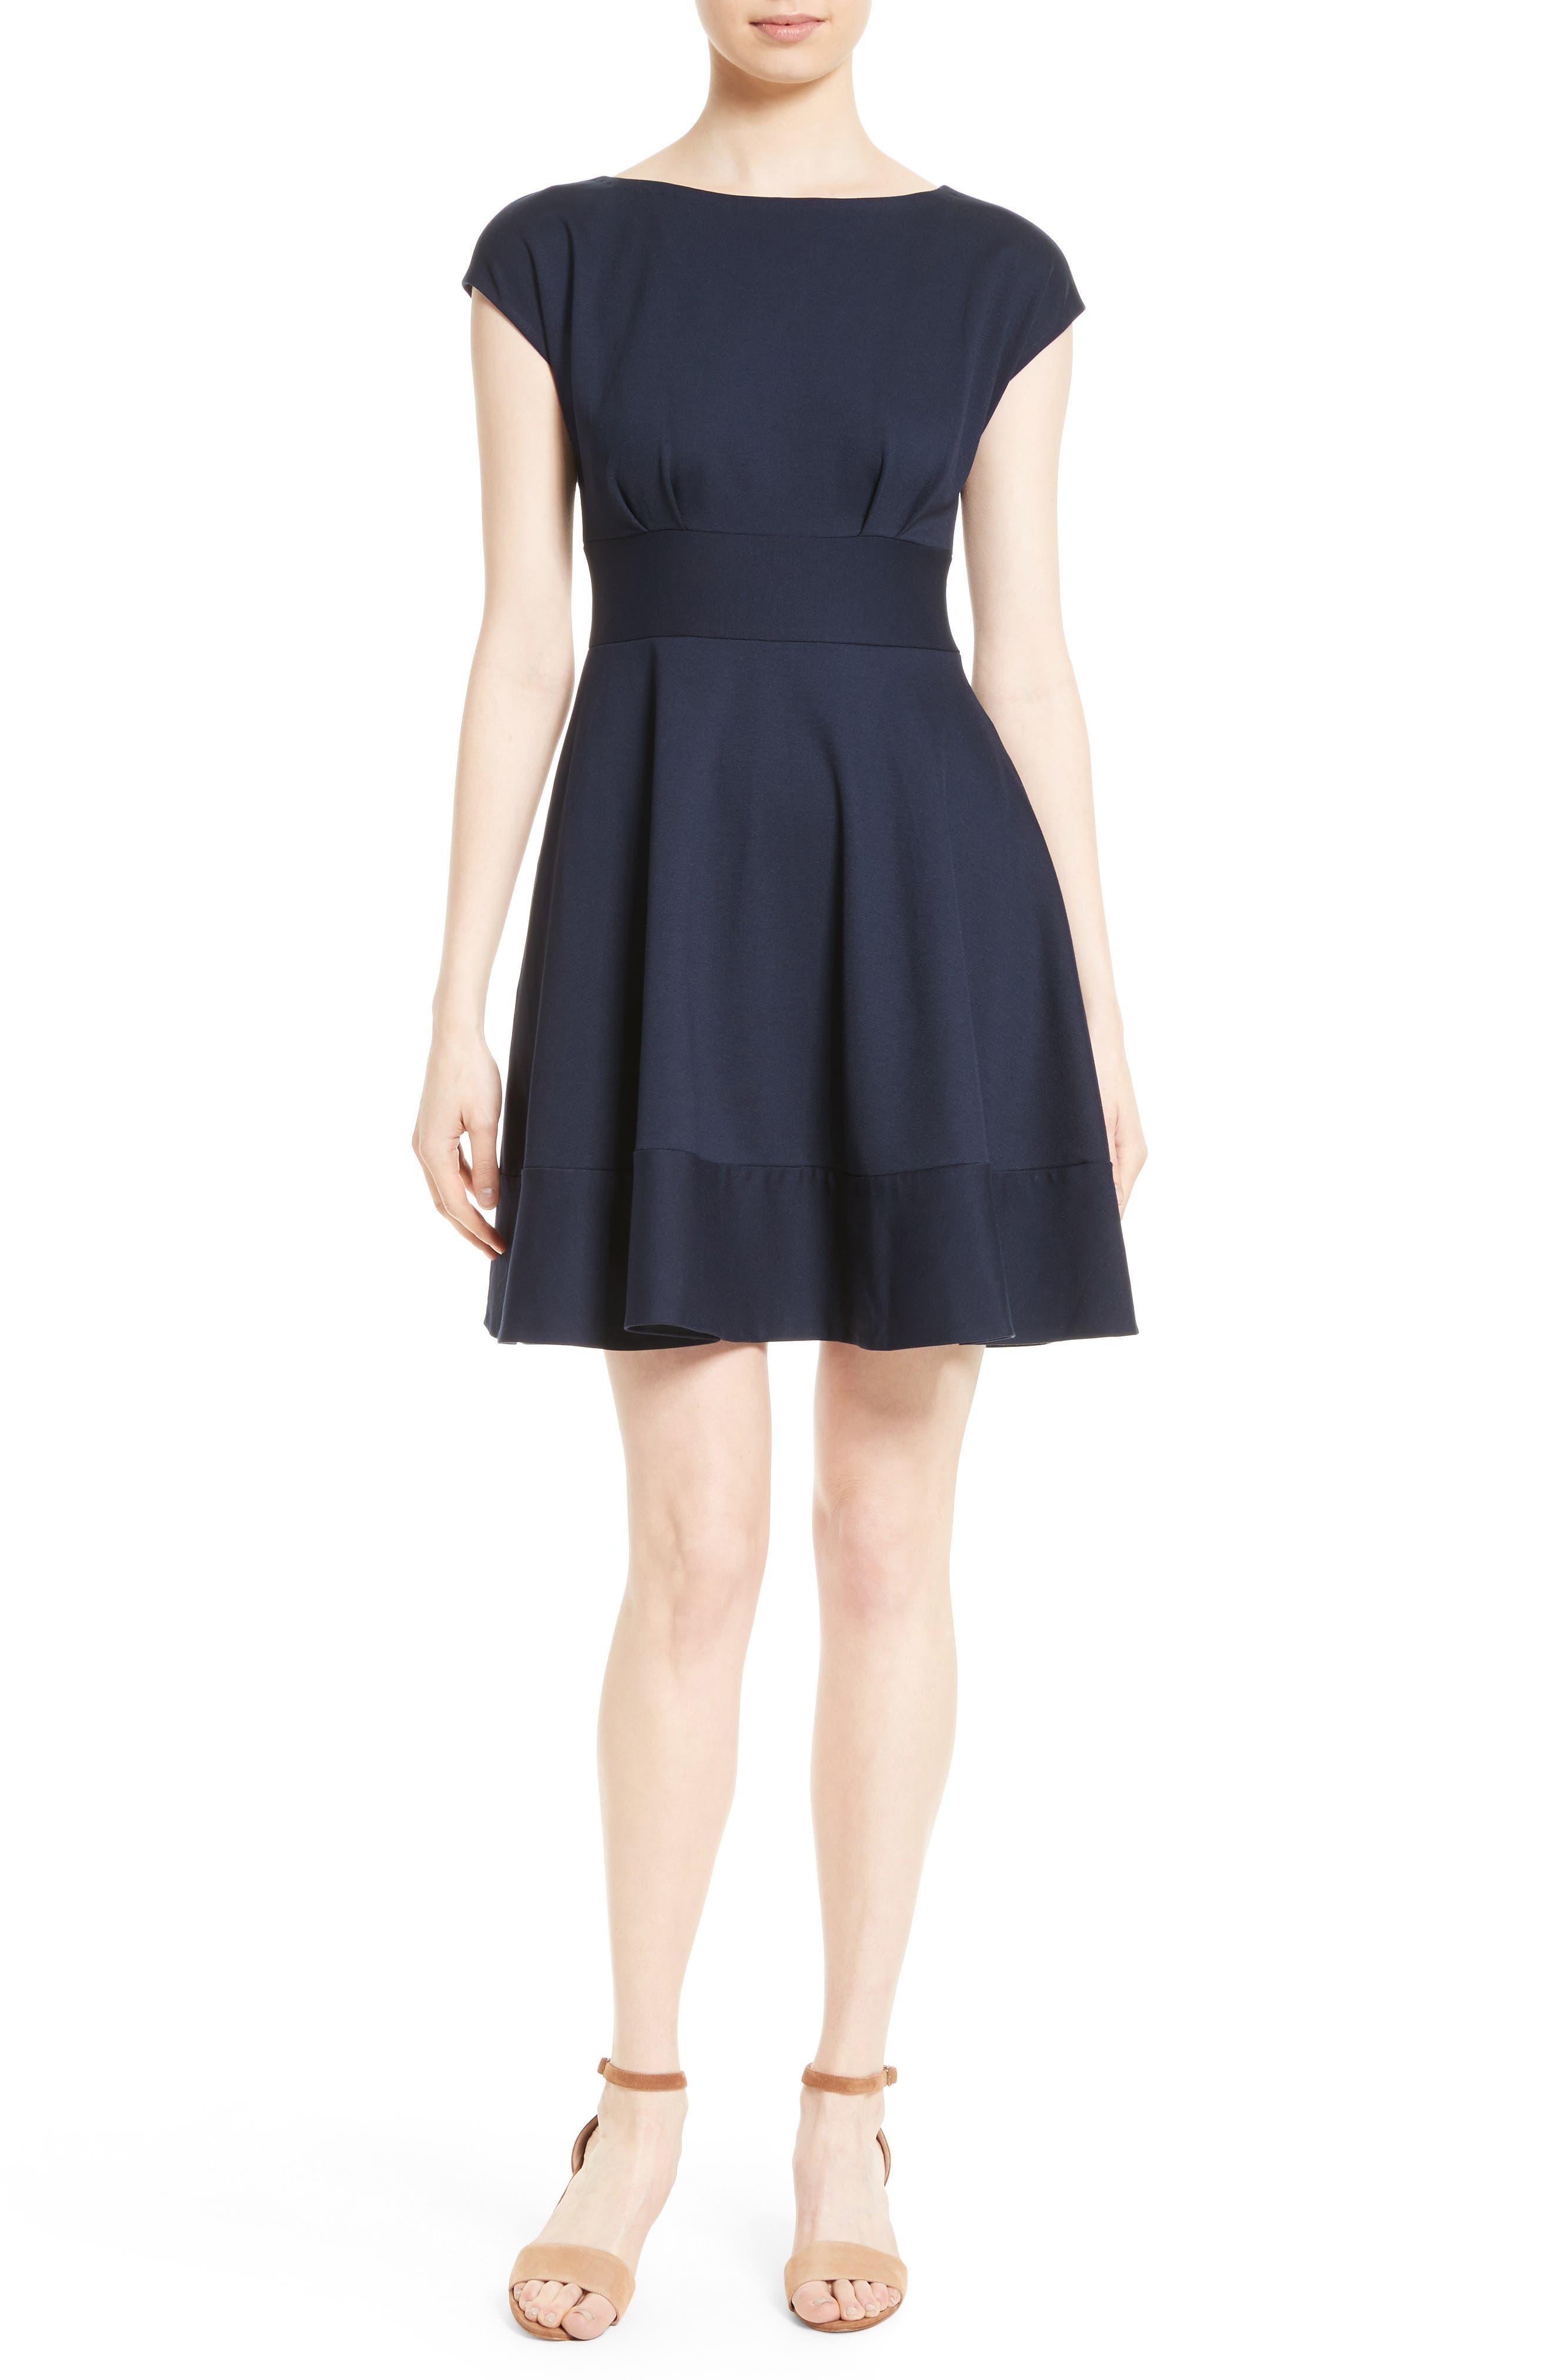 Kate Spade New York Ponte Fiorella Fit & Flare Dress